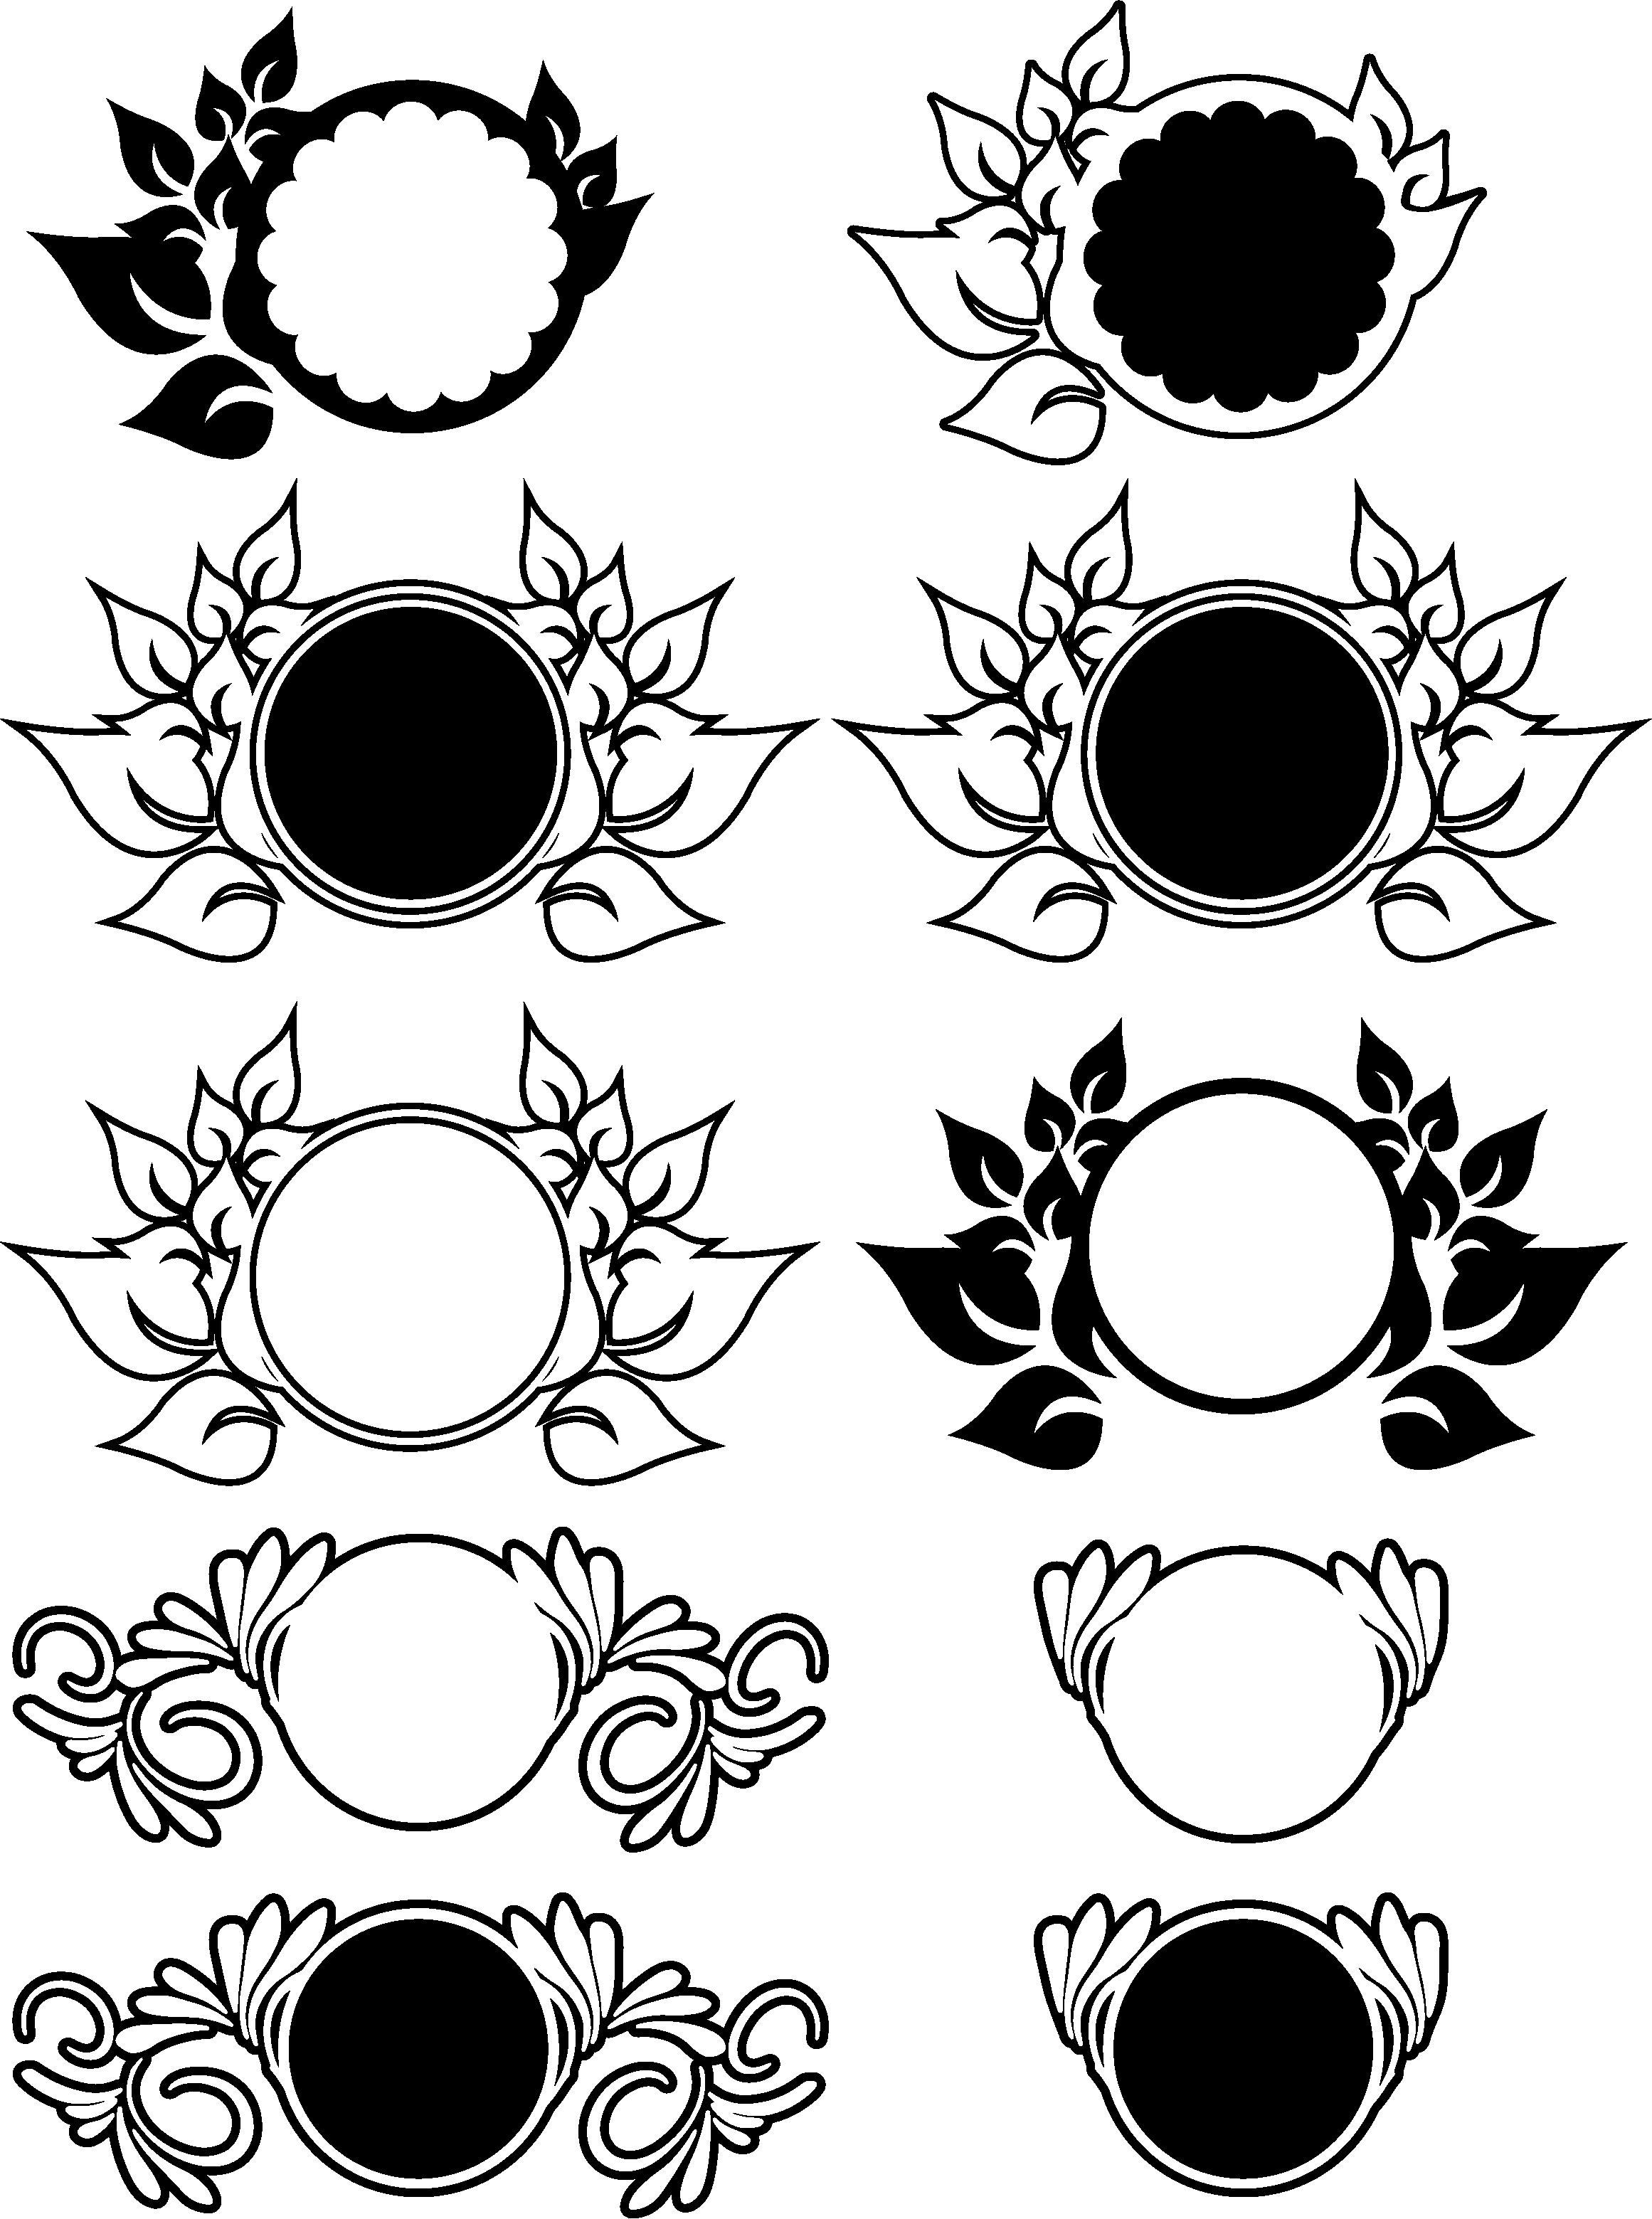 9 Floral Monograms Bundle SVG, DXF, JPG, PNG, DWG, AI, EPS example image 2